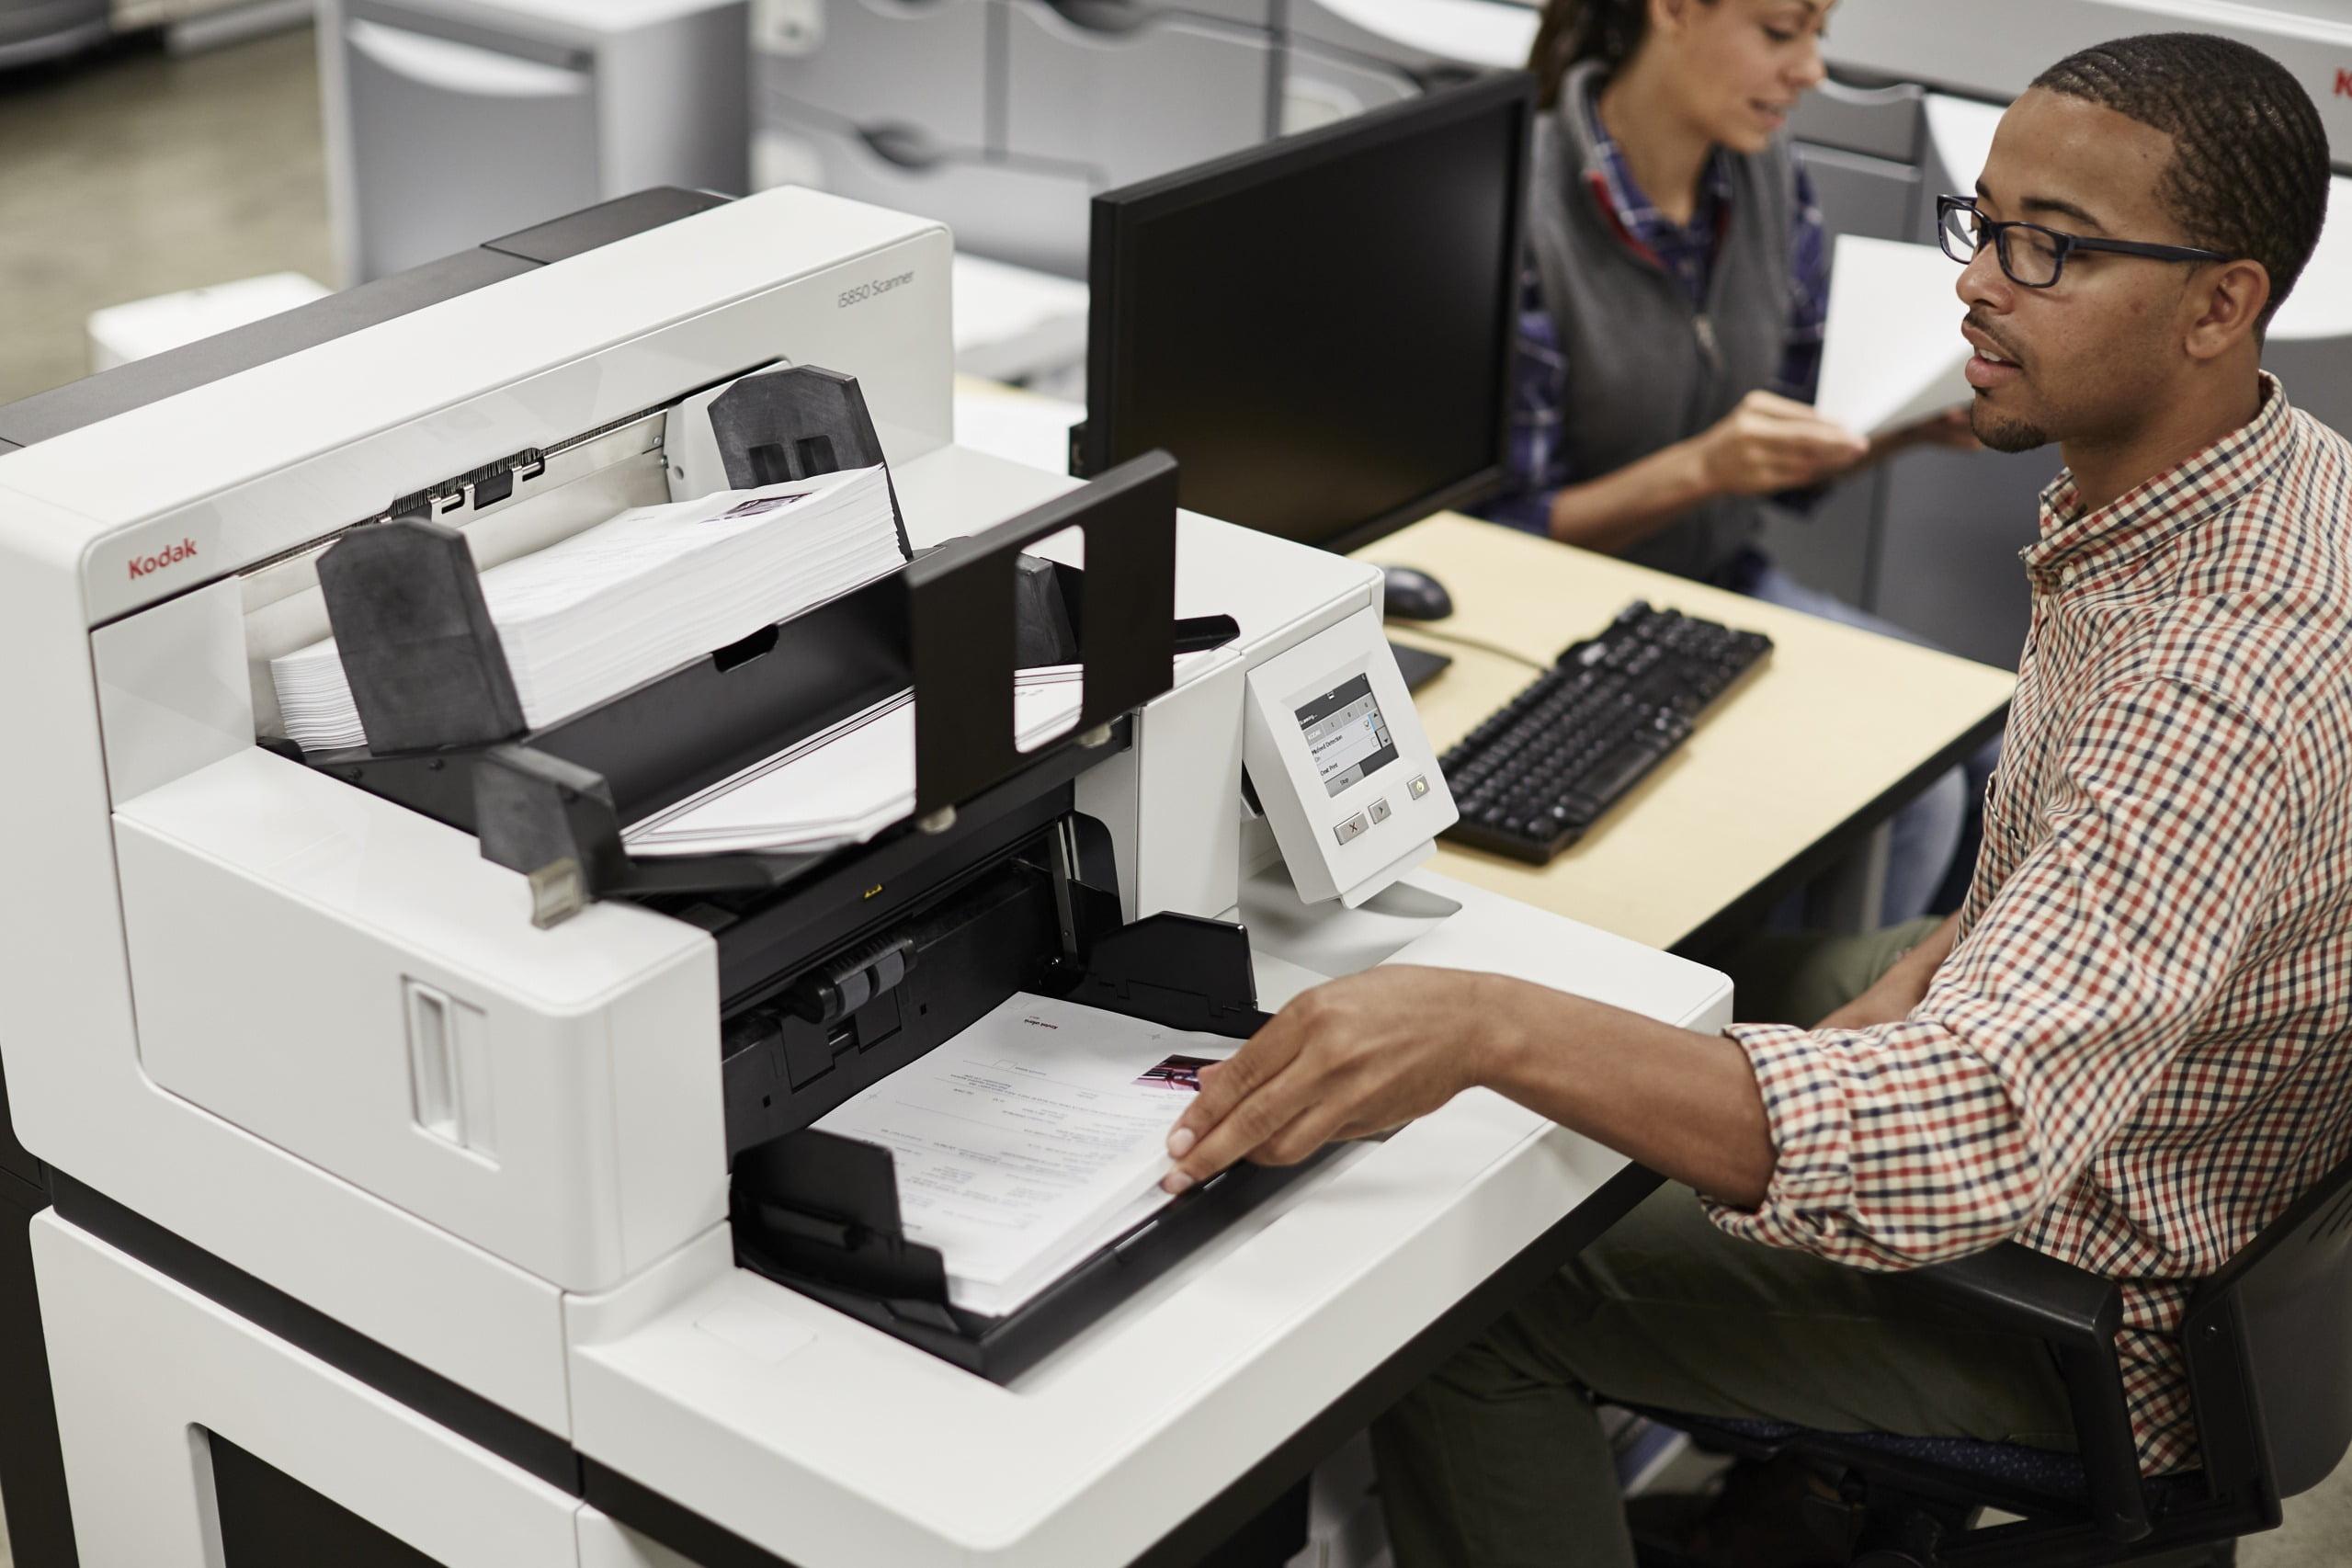 Man scanning document